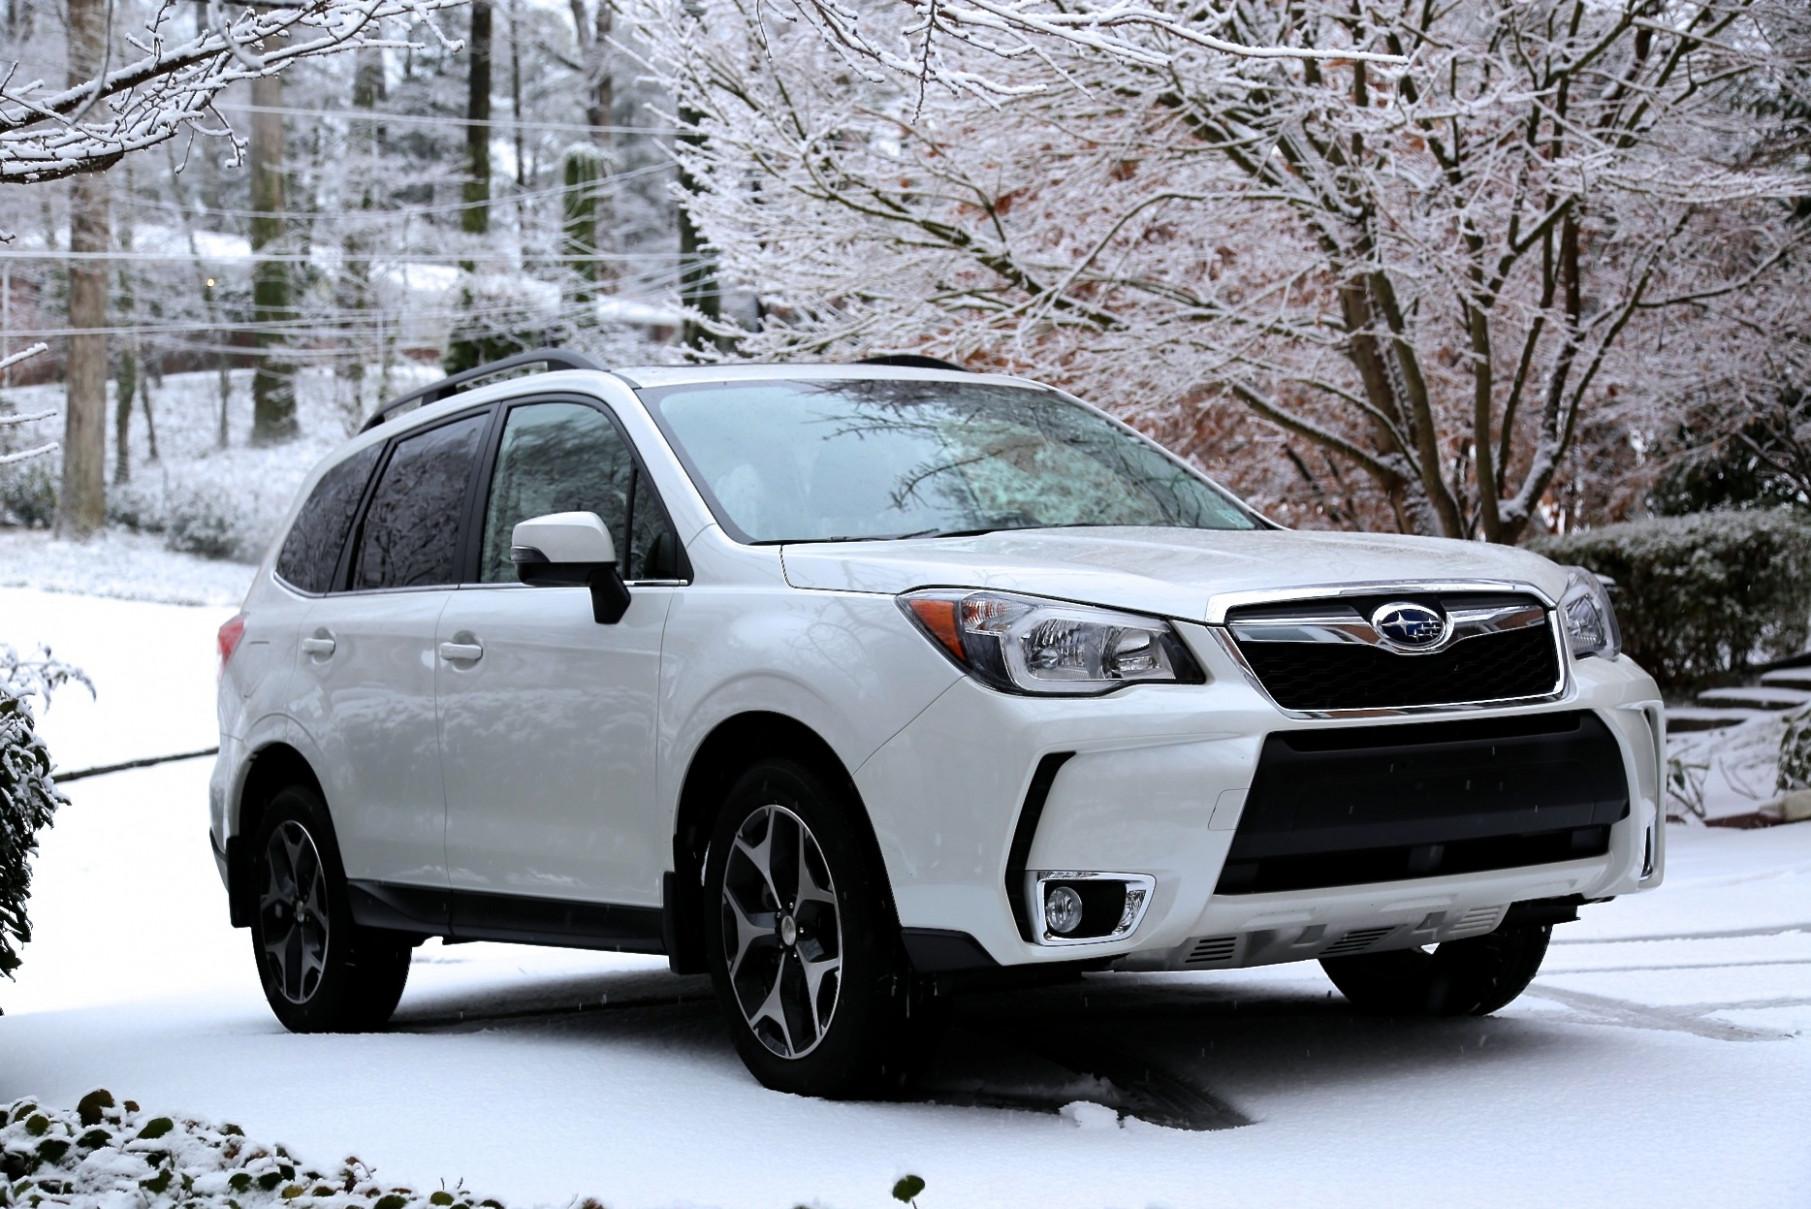 Wallpaper 2022 Subaru Forester Release Date